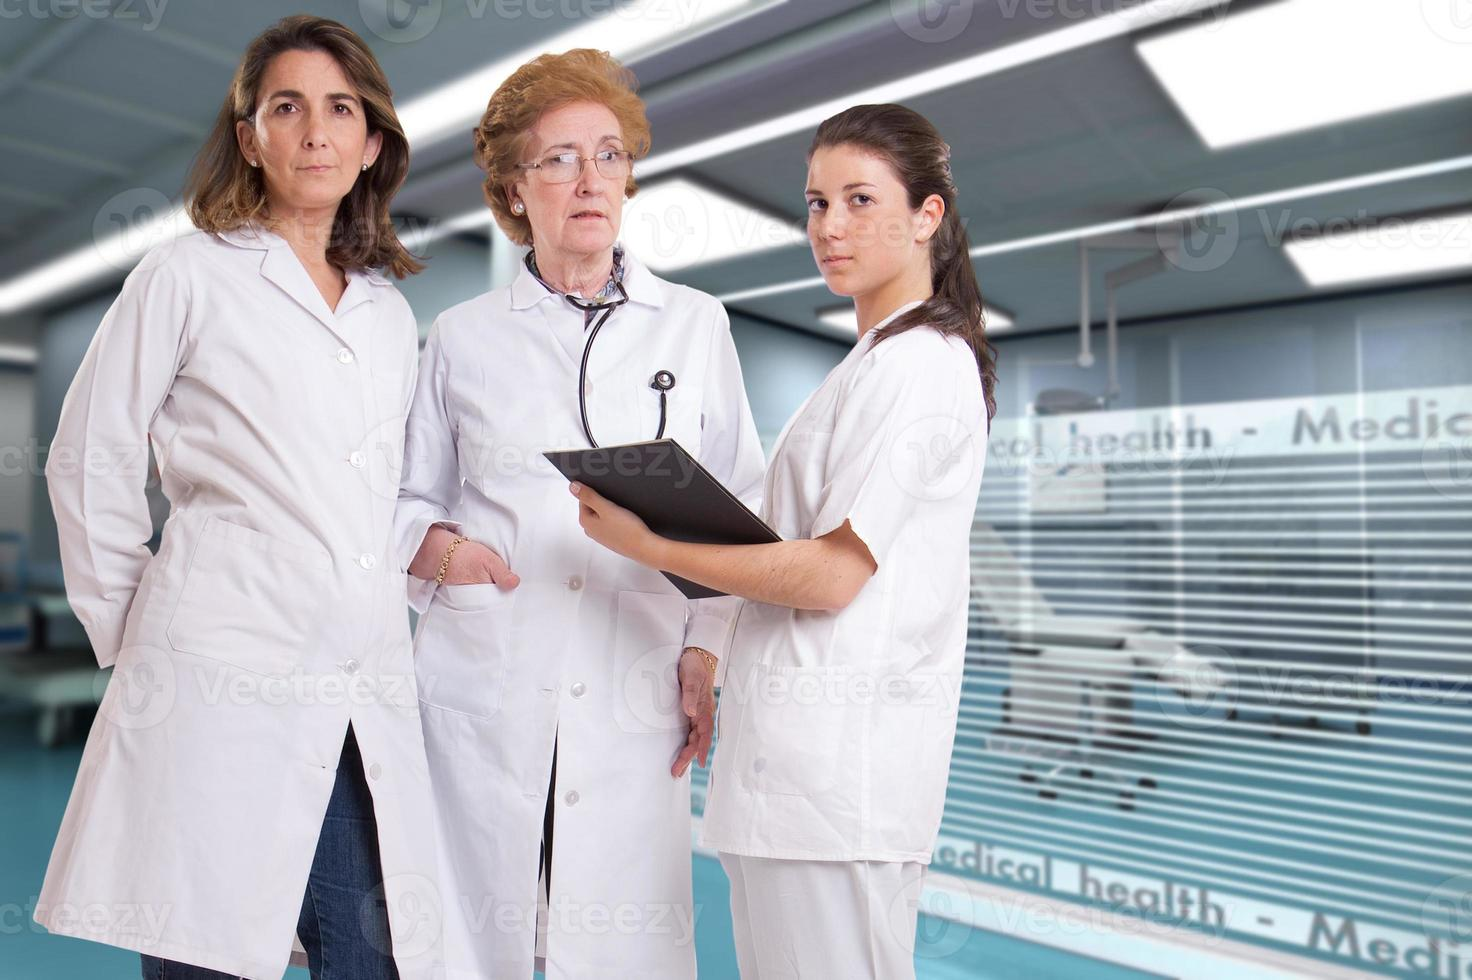 Female staff at the hospital photo